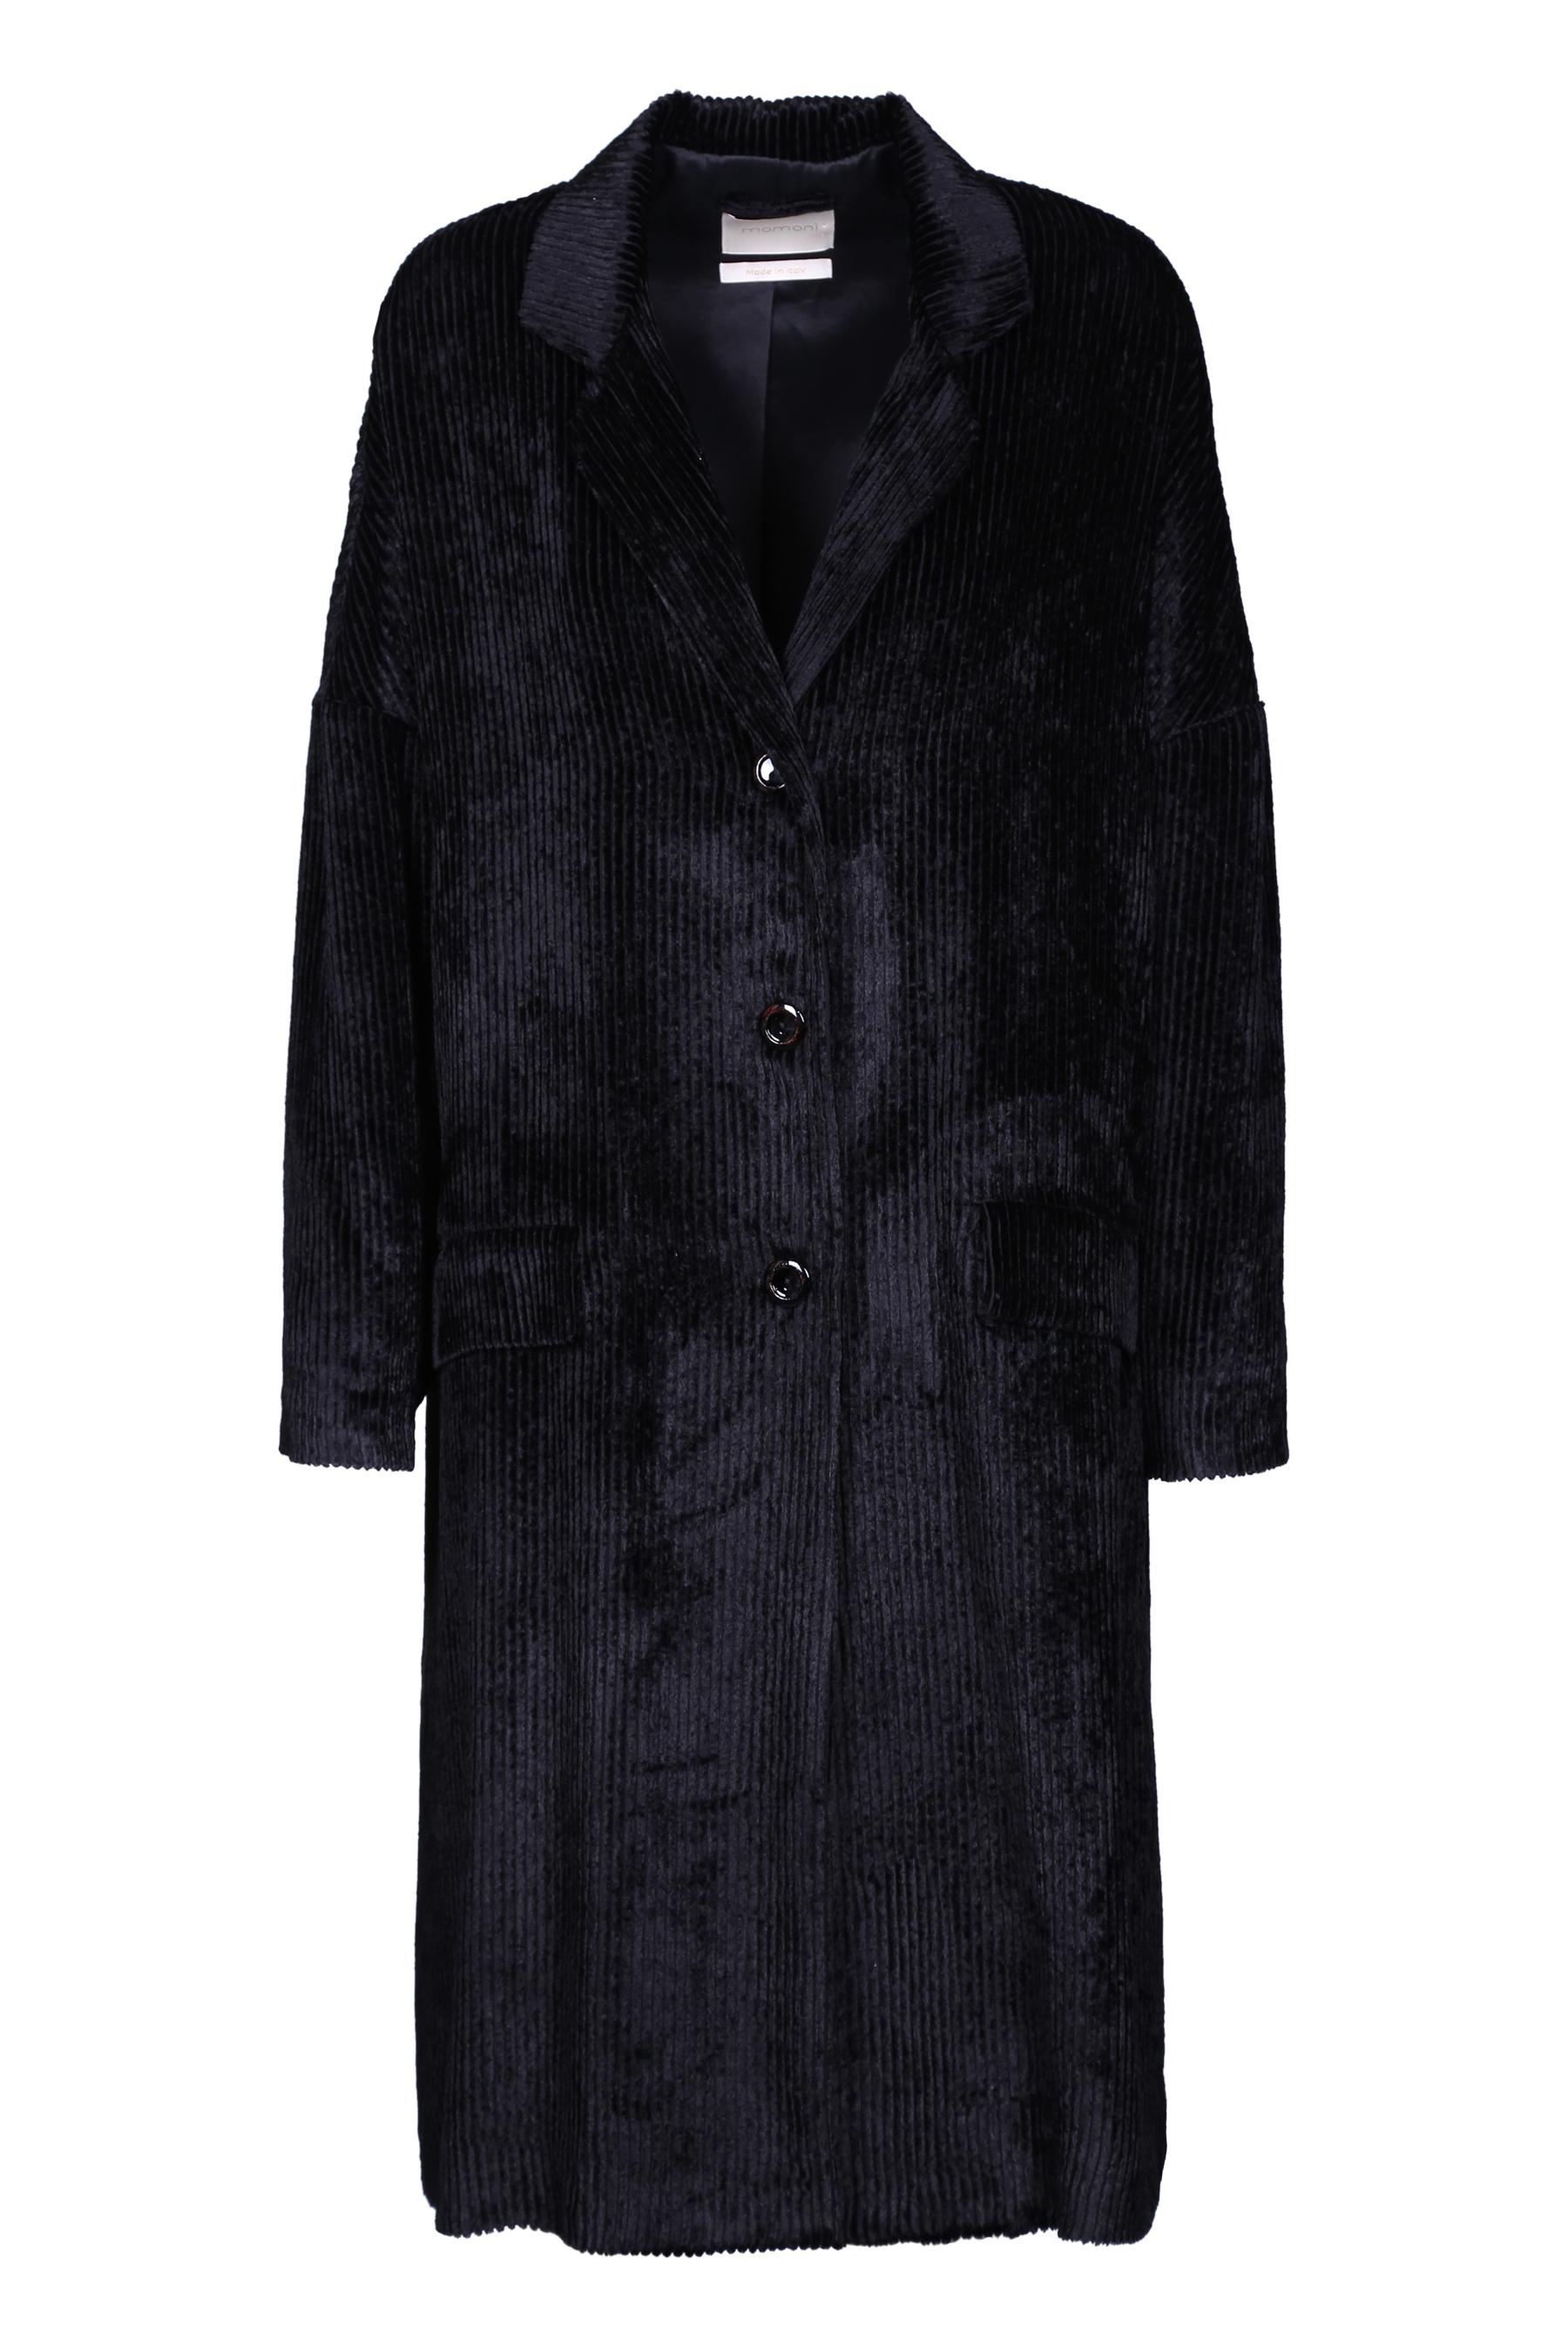 CORDUROY COAT MOMONI | Coat | MOC00050990